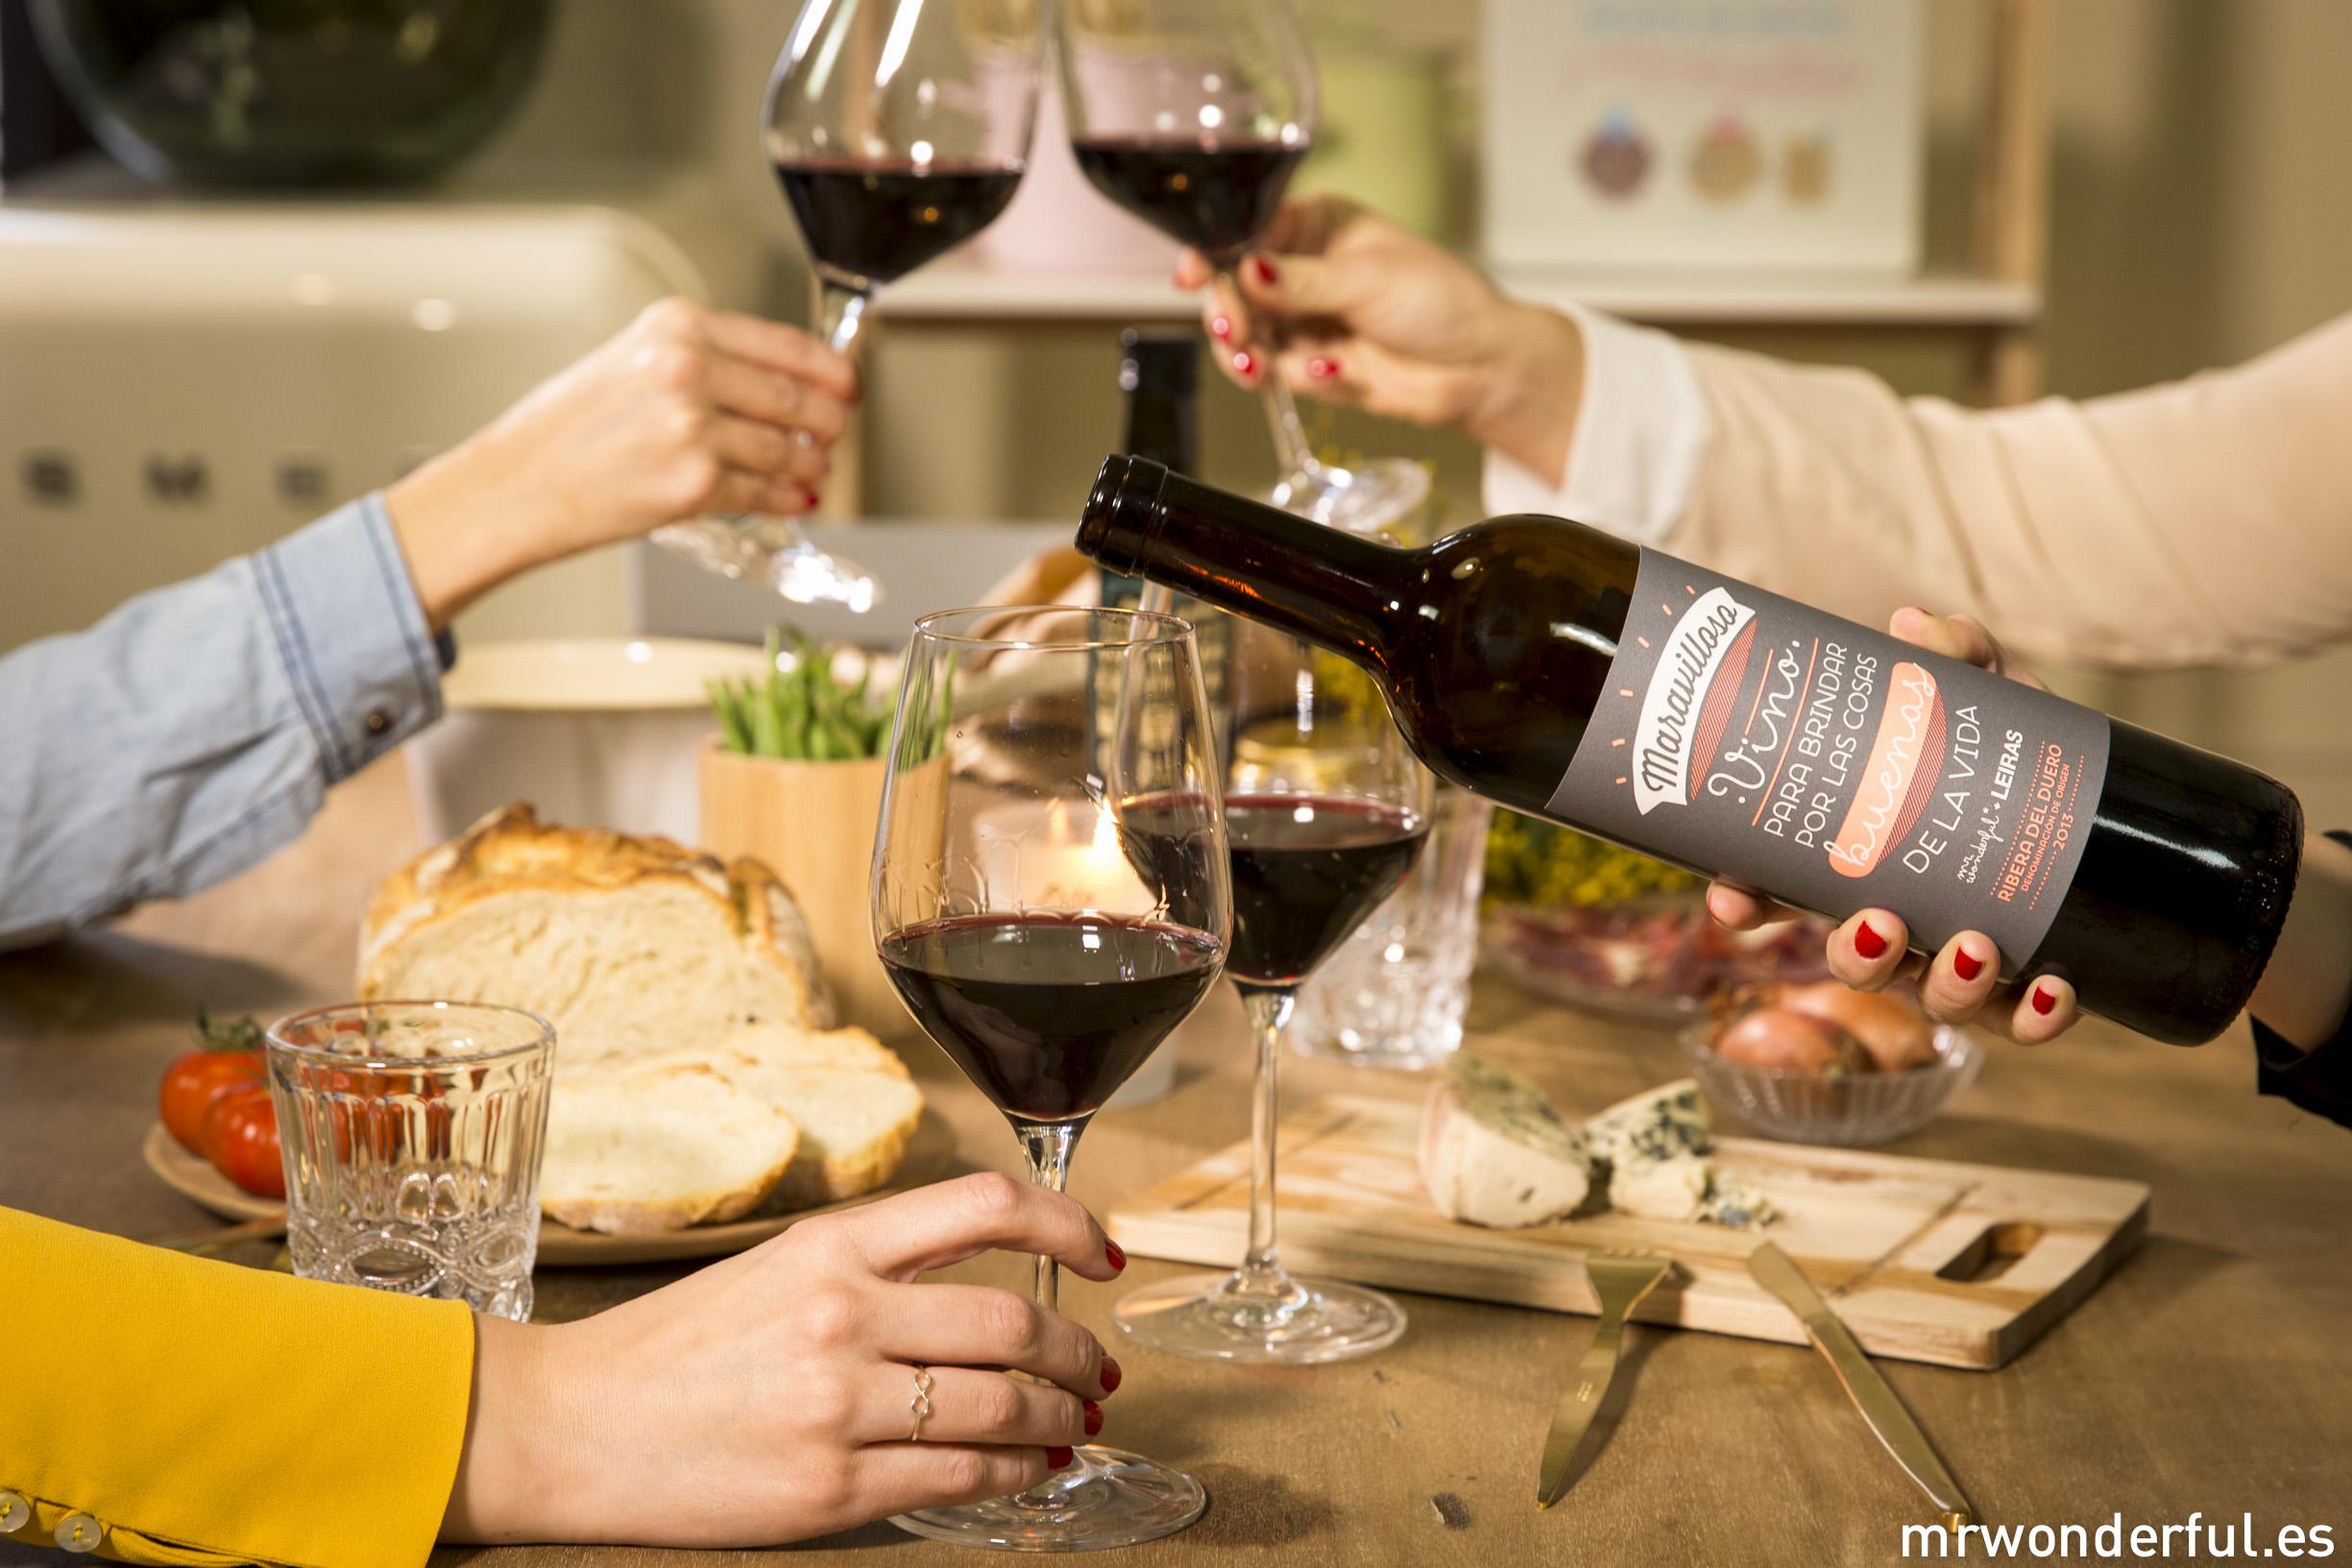 mrwonderful_codorniu_vinos-maravillosos_2015-517